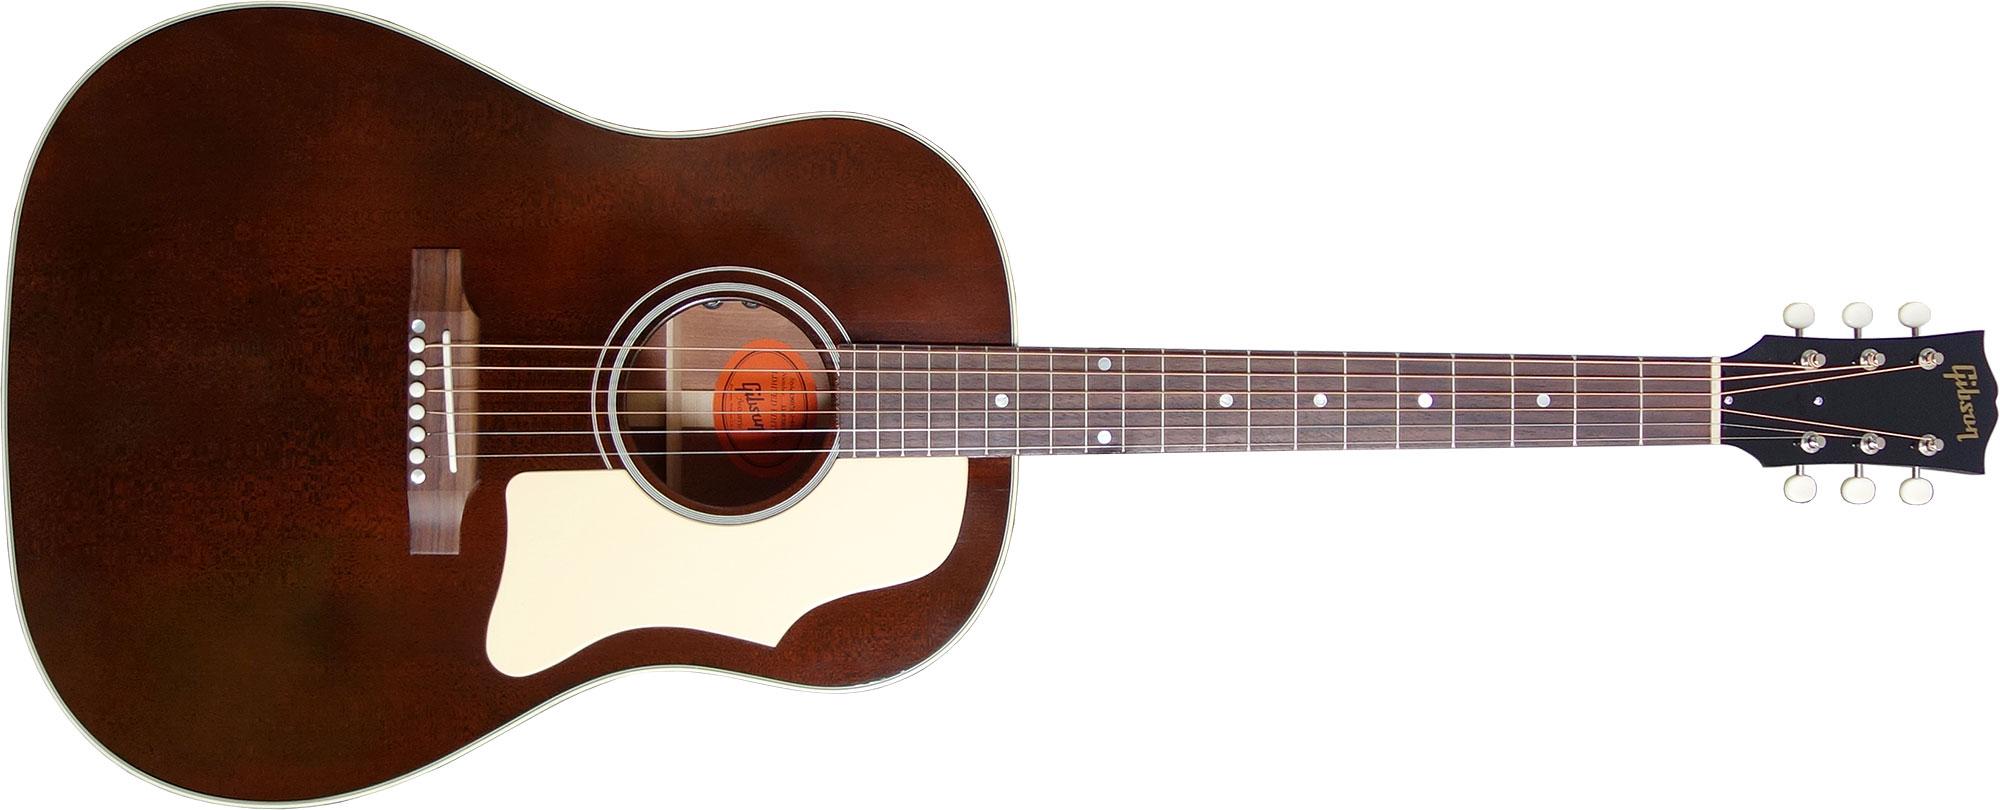 Gibson 1960s J-45 Brown Top Thin Finishの全体画像